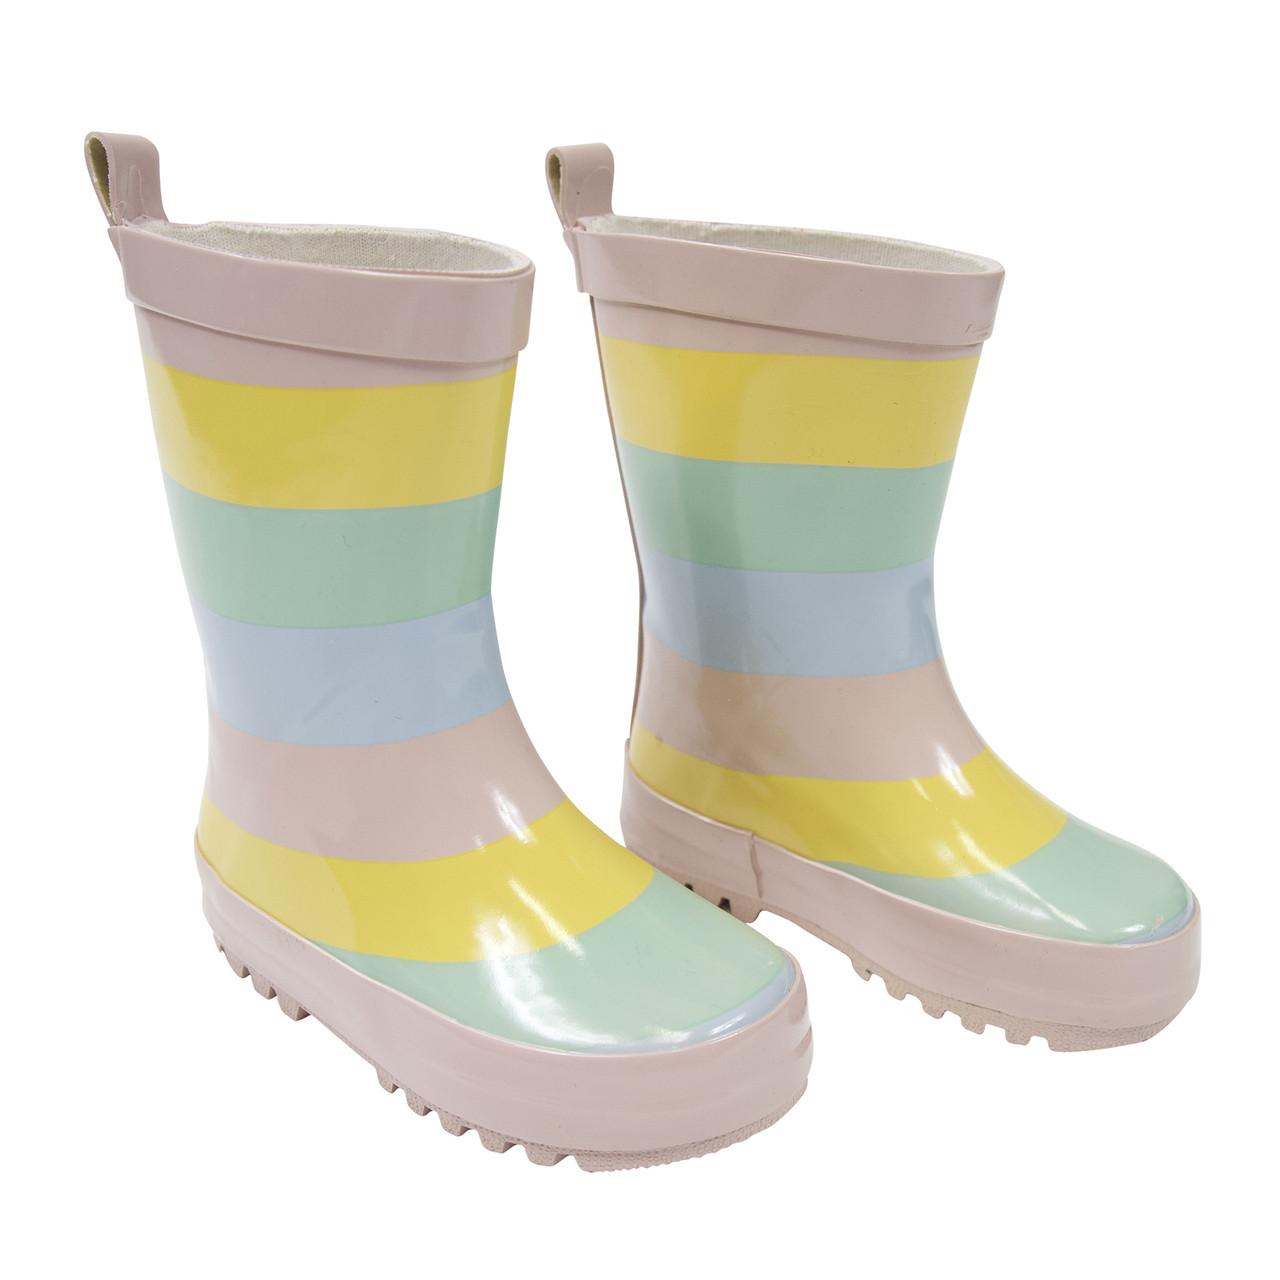 Korango Rainwear Gumboot - Girl Striped at Baby Barn Discounts Korango cute stylish design rainboot perfect for rainy weather.